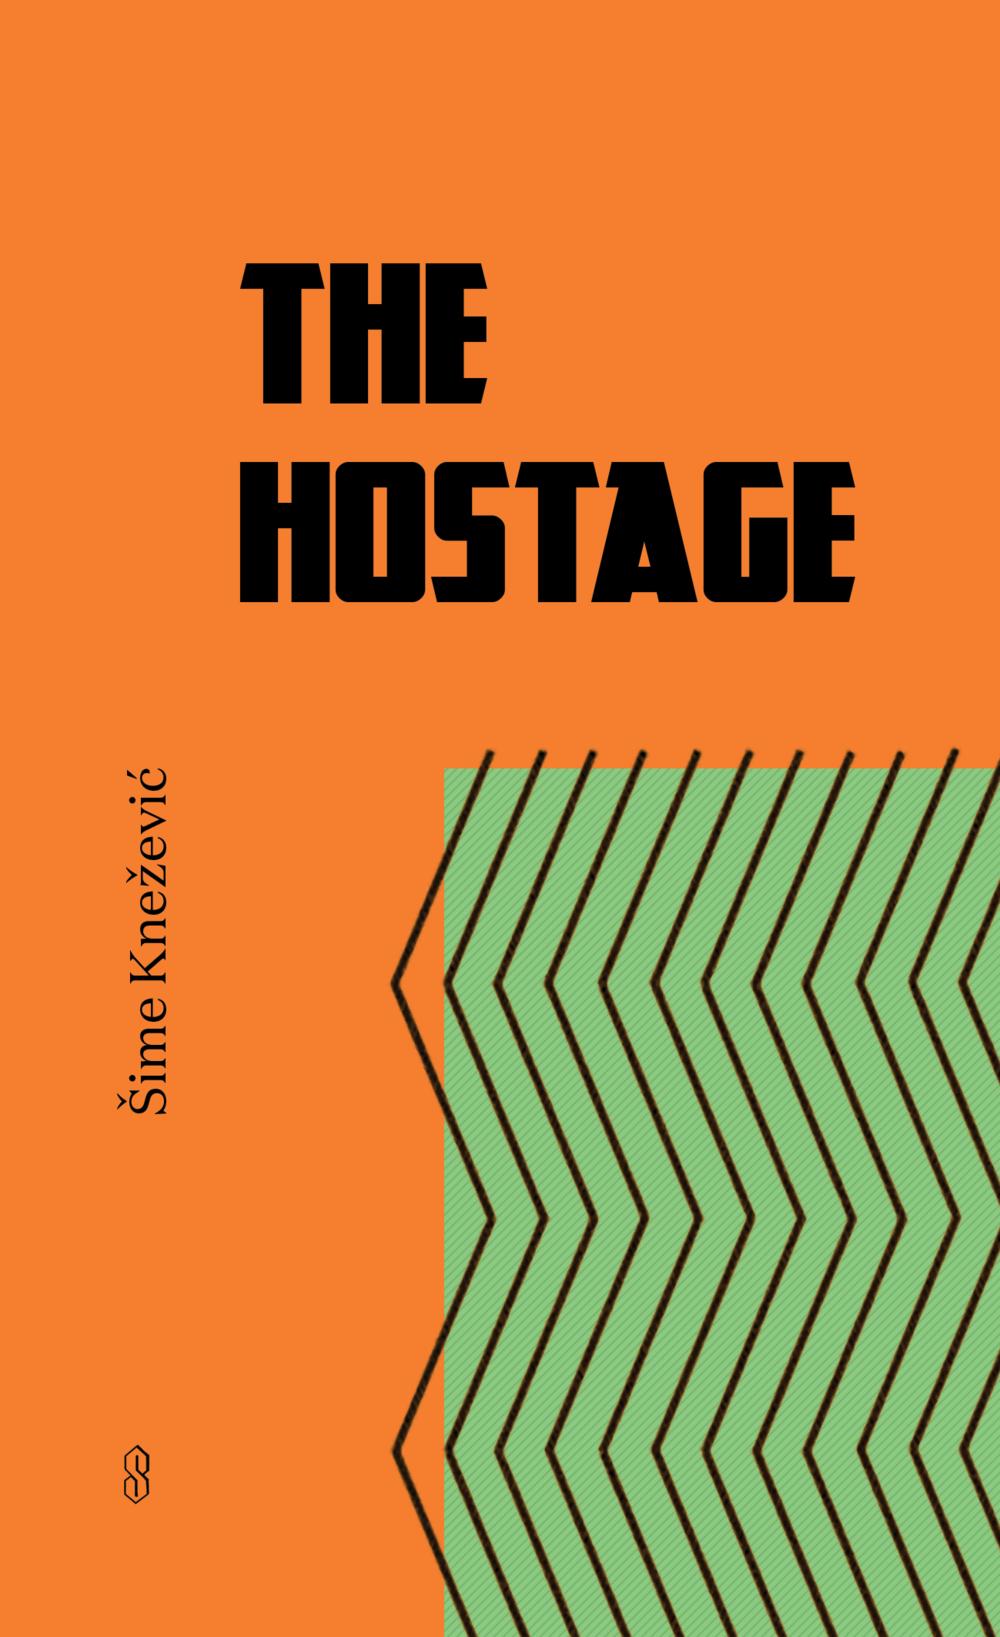 THE HOSTAGE_SIME KNEZEVIC.png